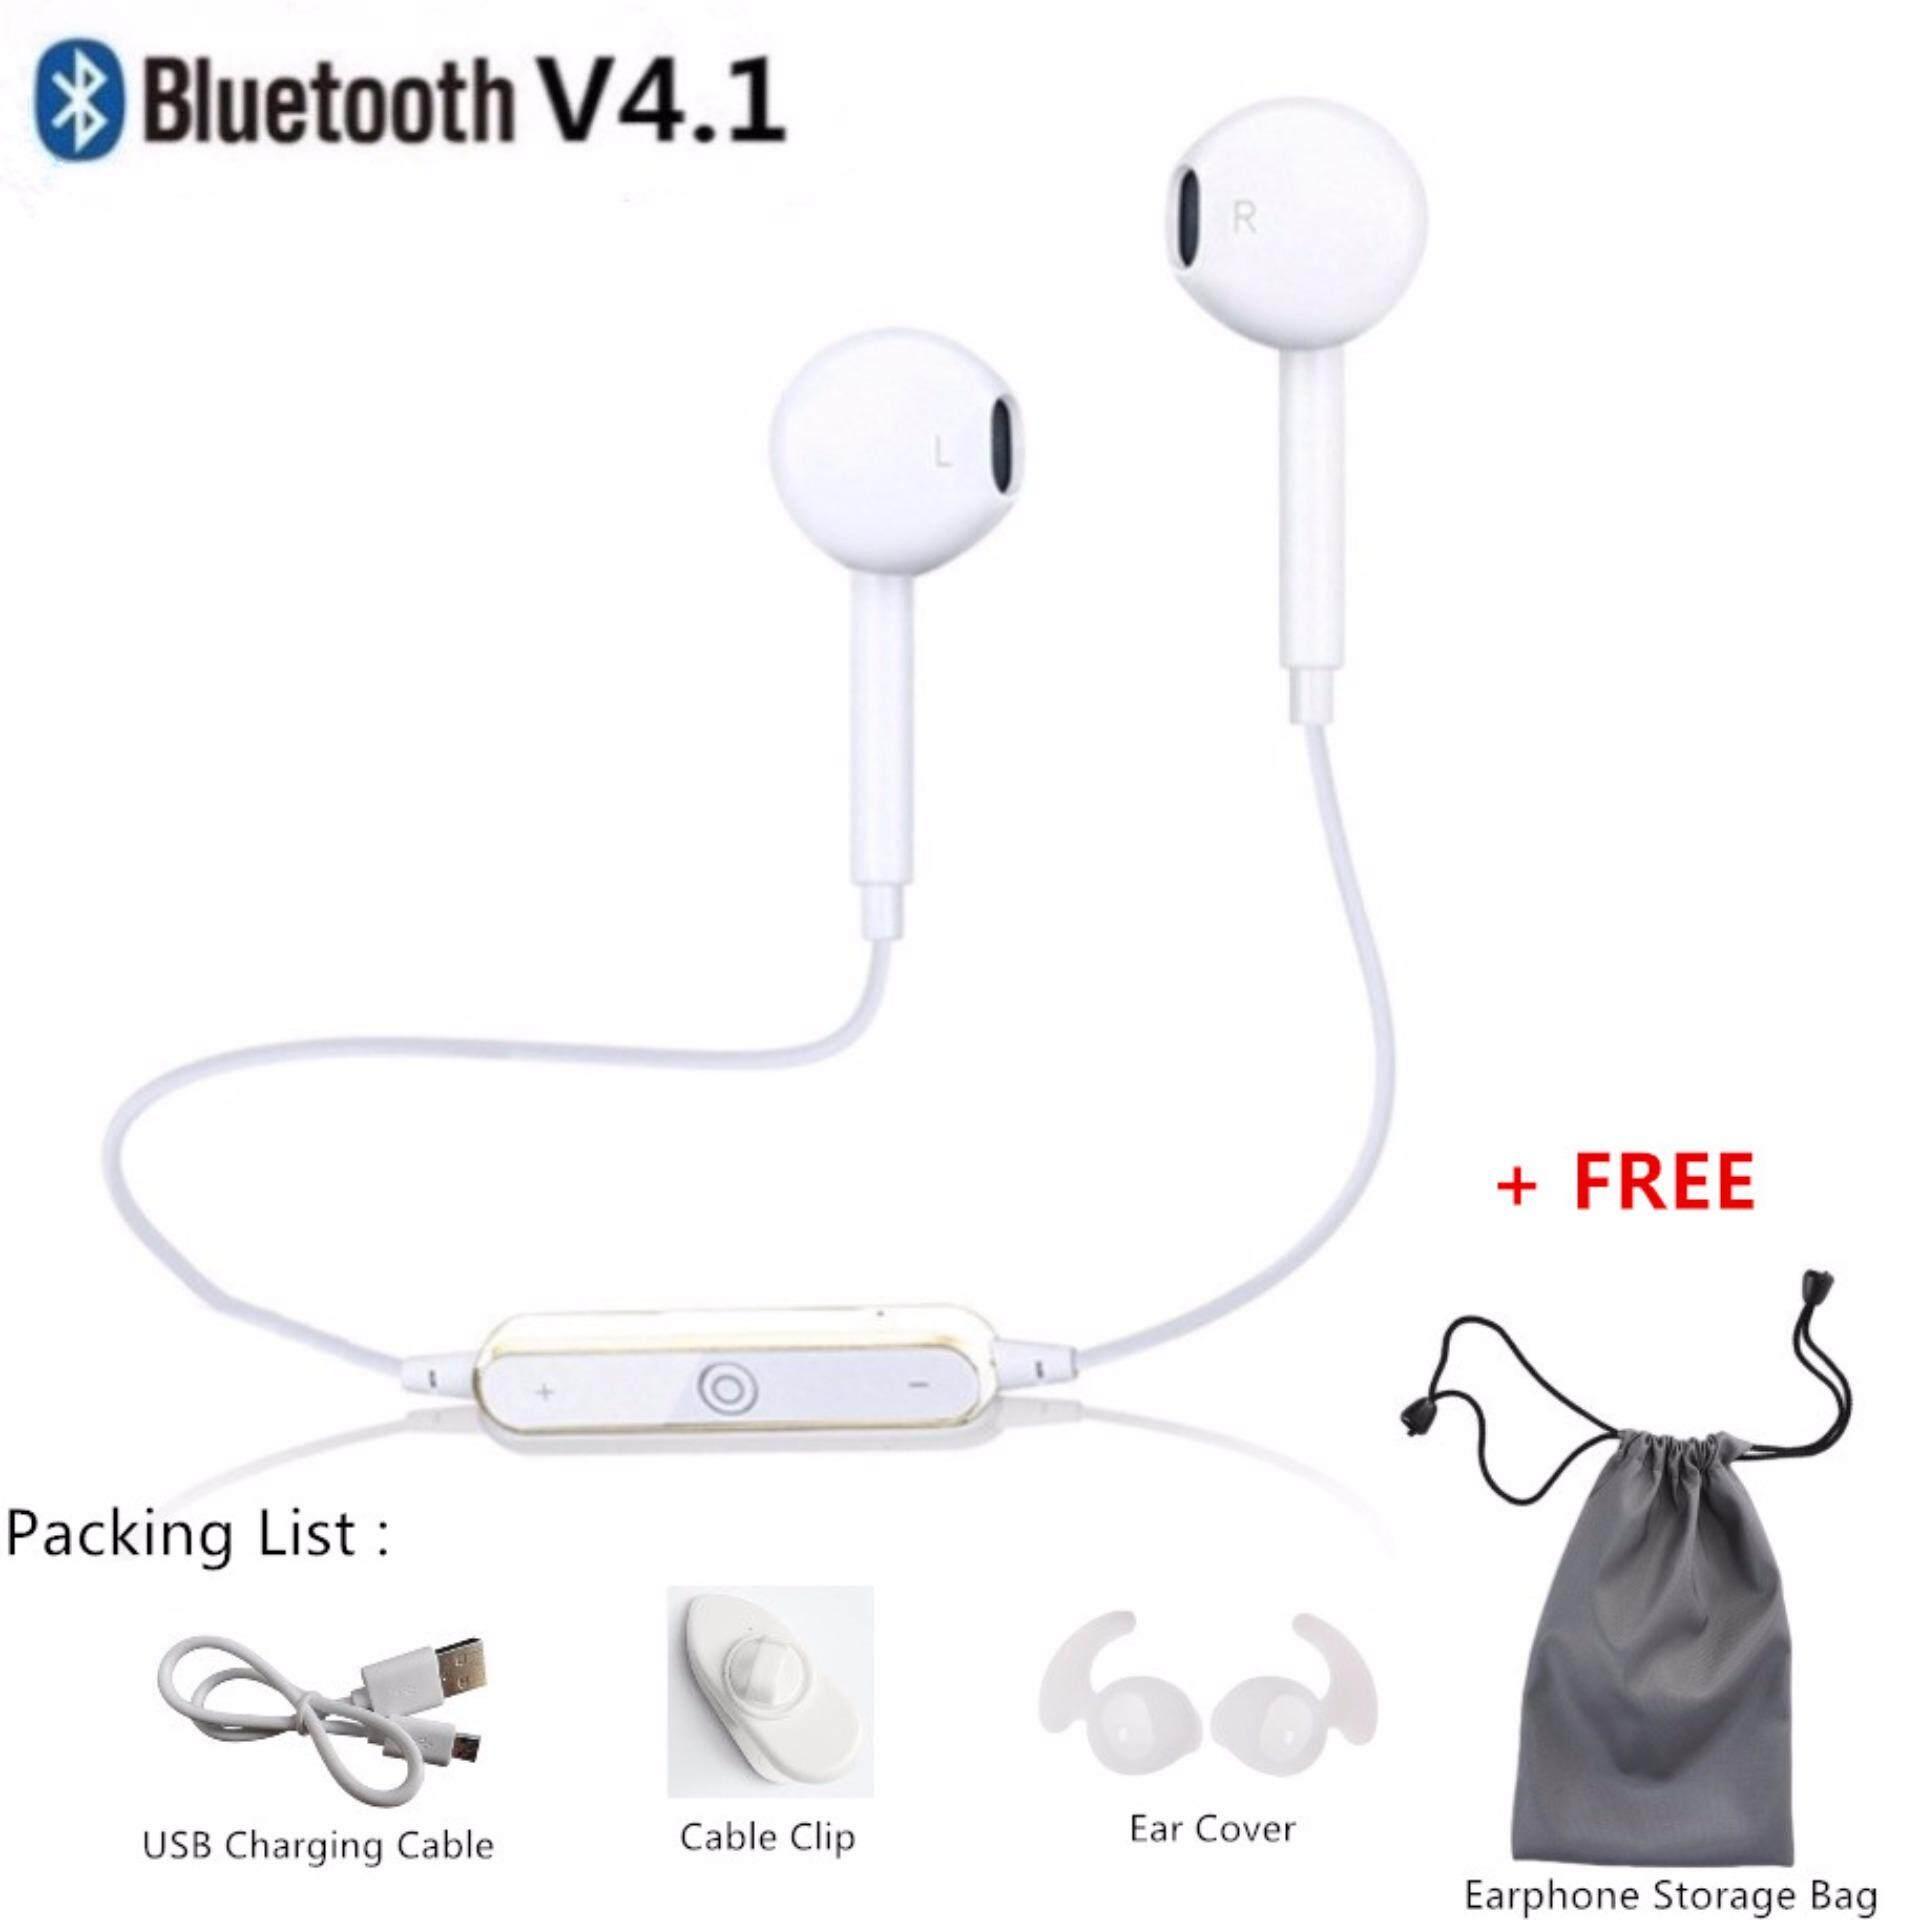 Wireless Earbuds - Buy Wireless Earbuds at Best Price in Malaysia | www.lazada.com.my